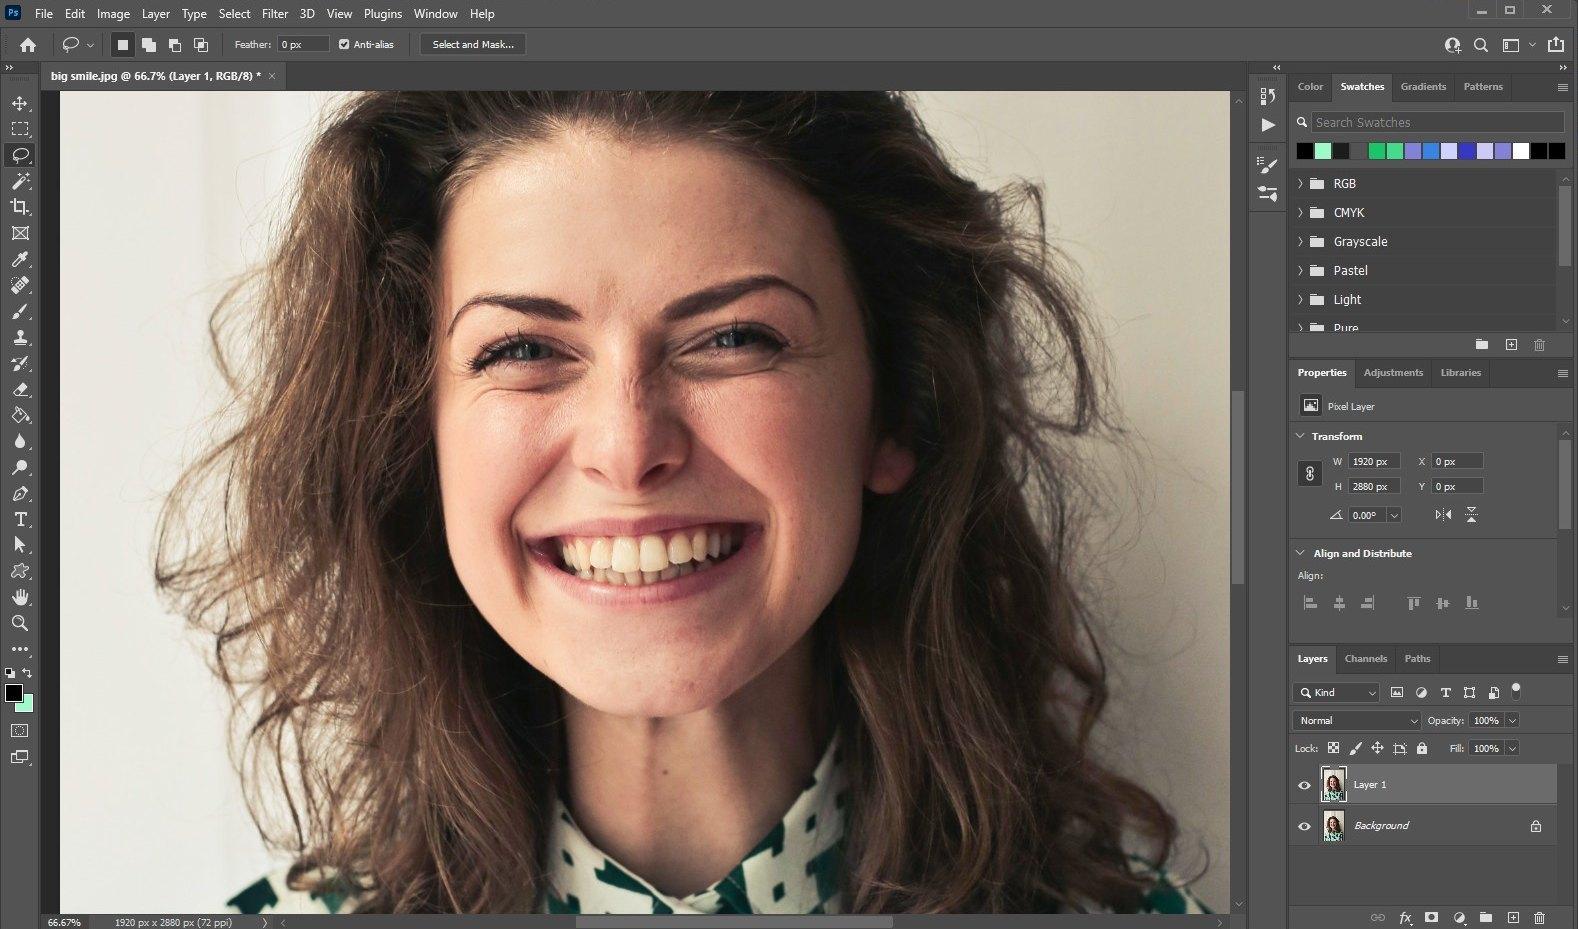 how to whiten teeth photoshop - 1